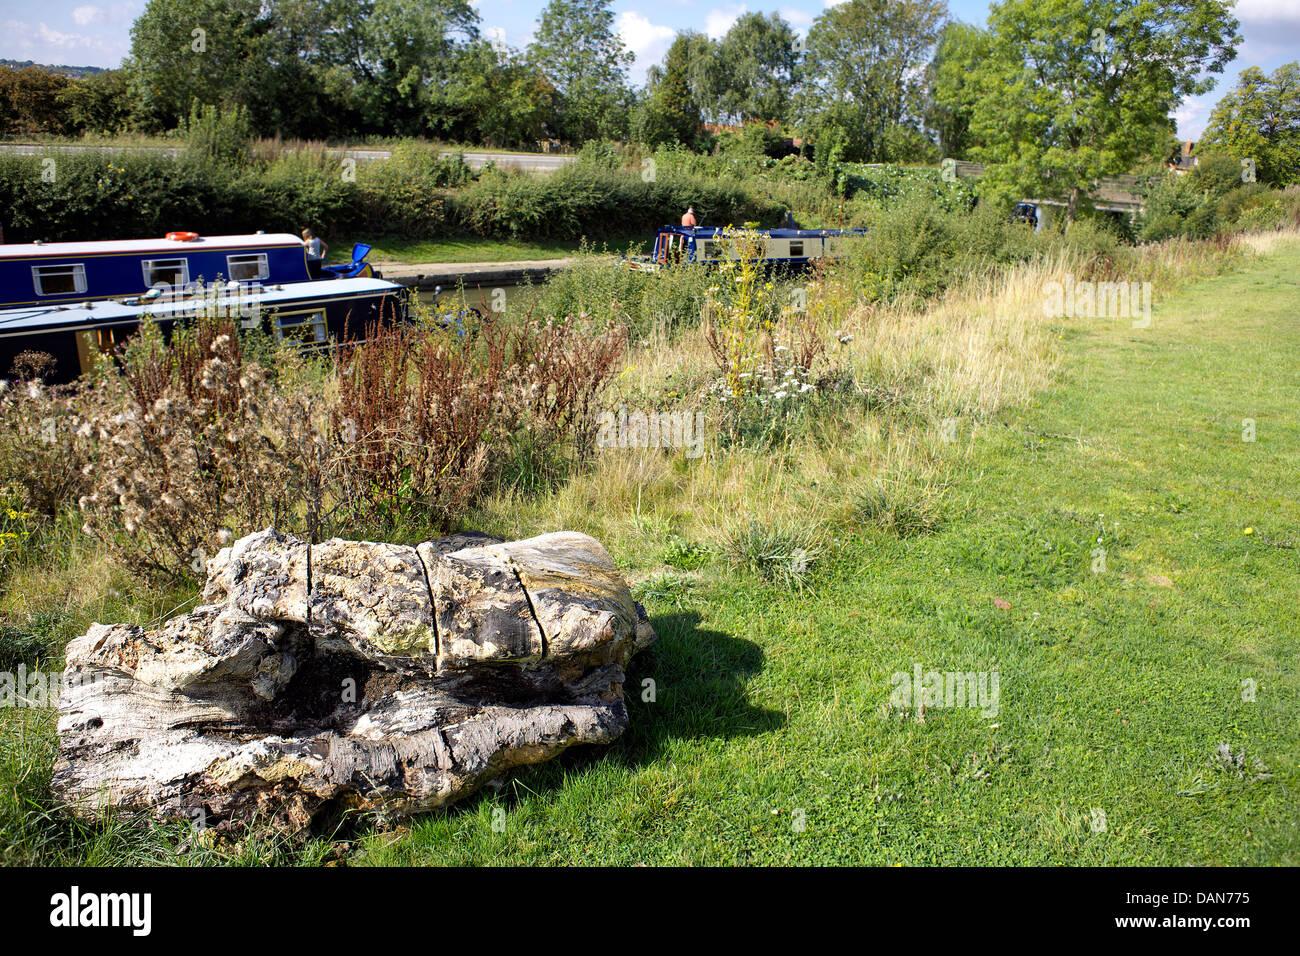 Boats on the Grand Union Canal, Braunston, Northamptonshire, Northants, England, UK, GB, narrowboat, narrowboats, - Stock Image